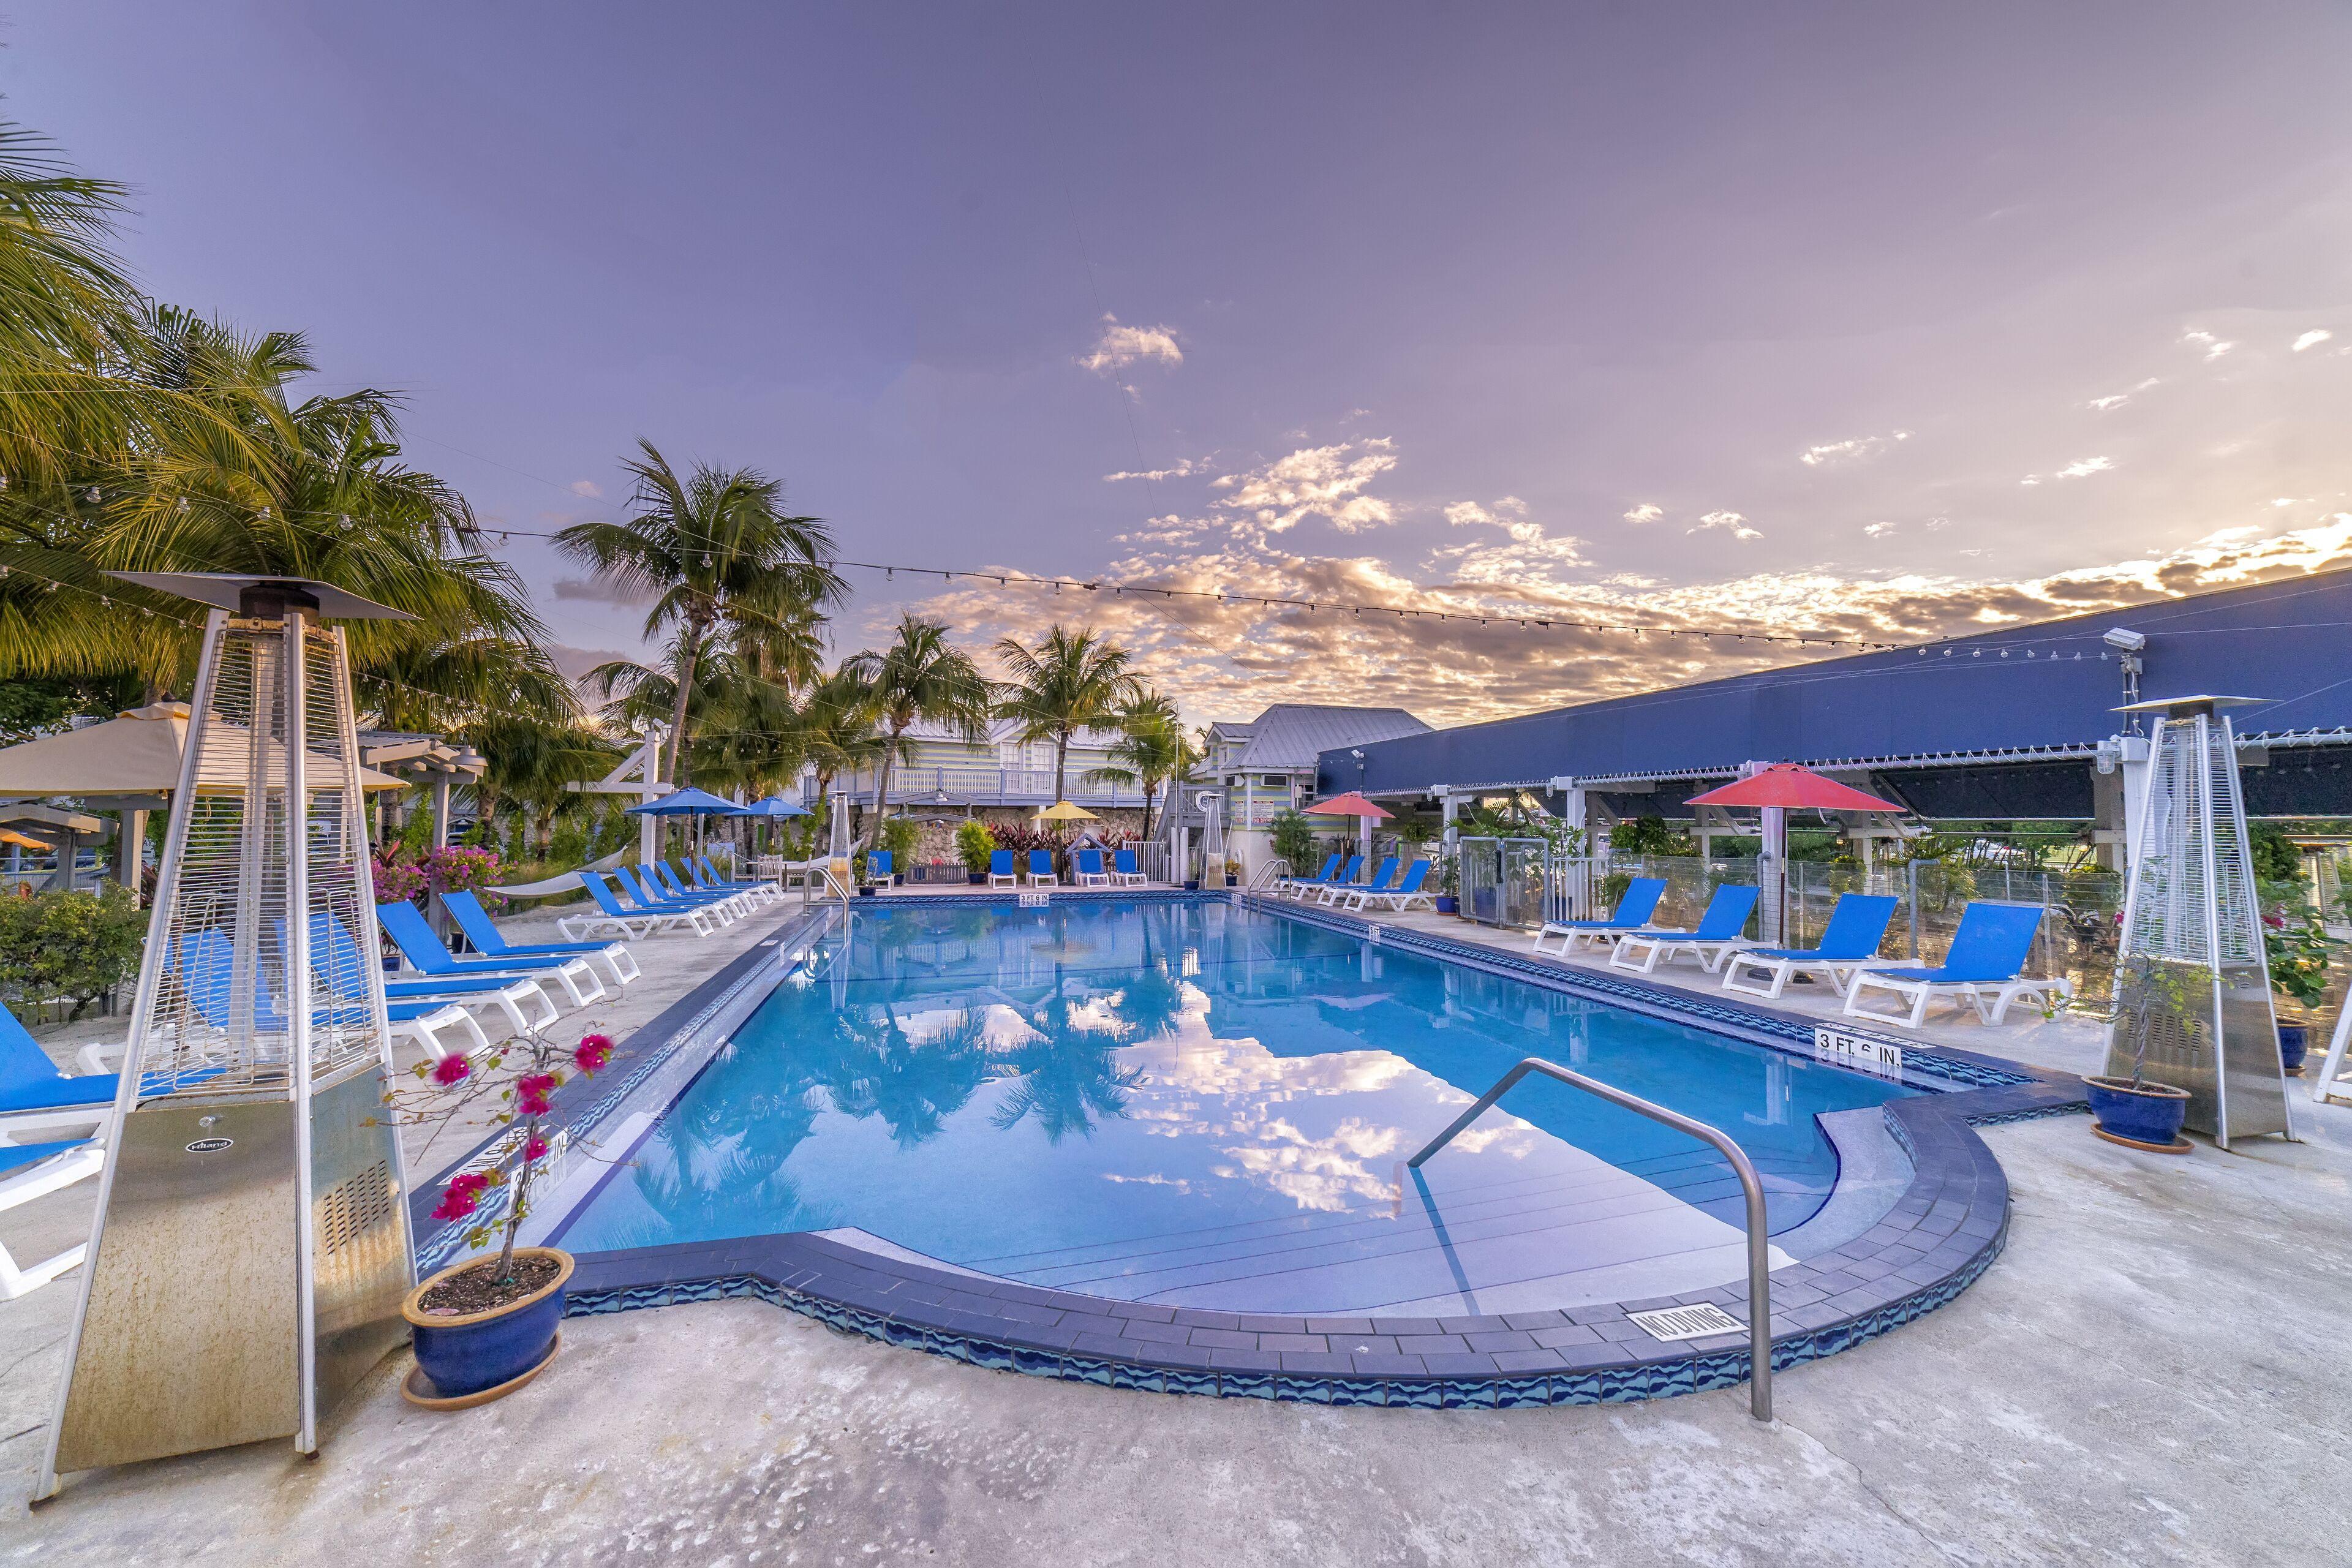 Courtesy of Ibis Bay Beach Resort / Expedia